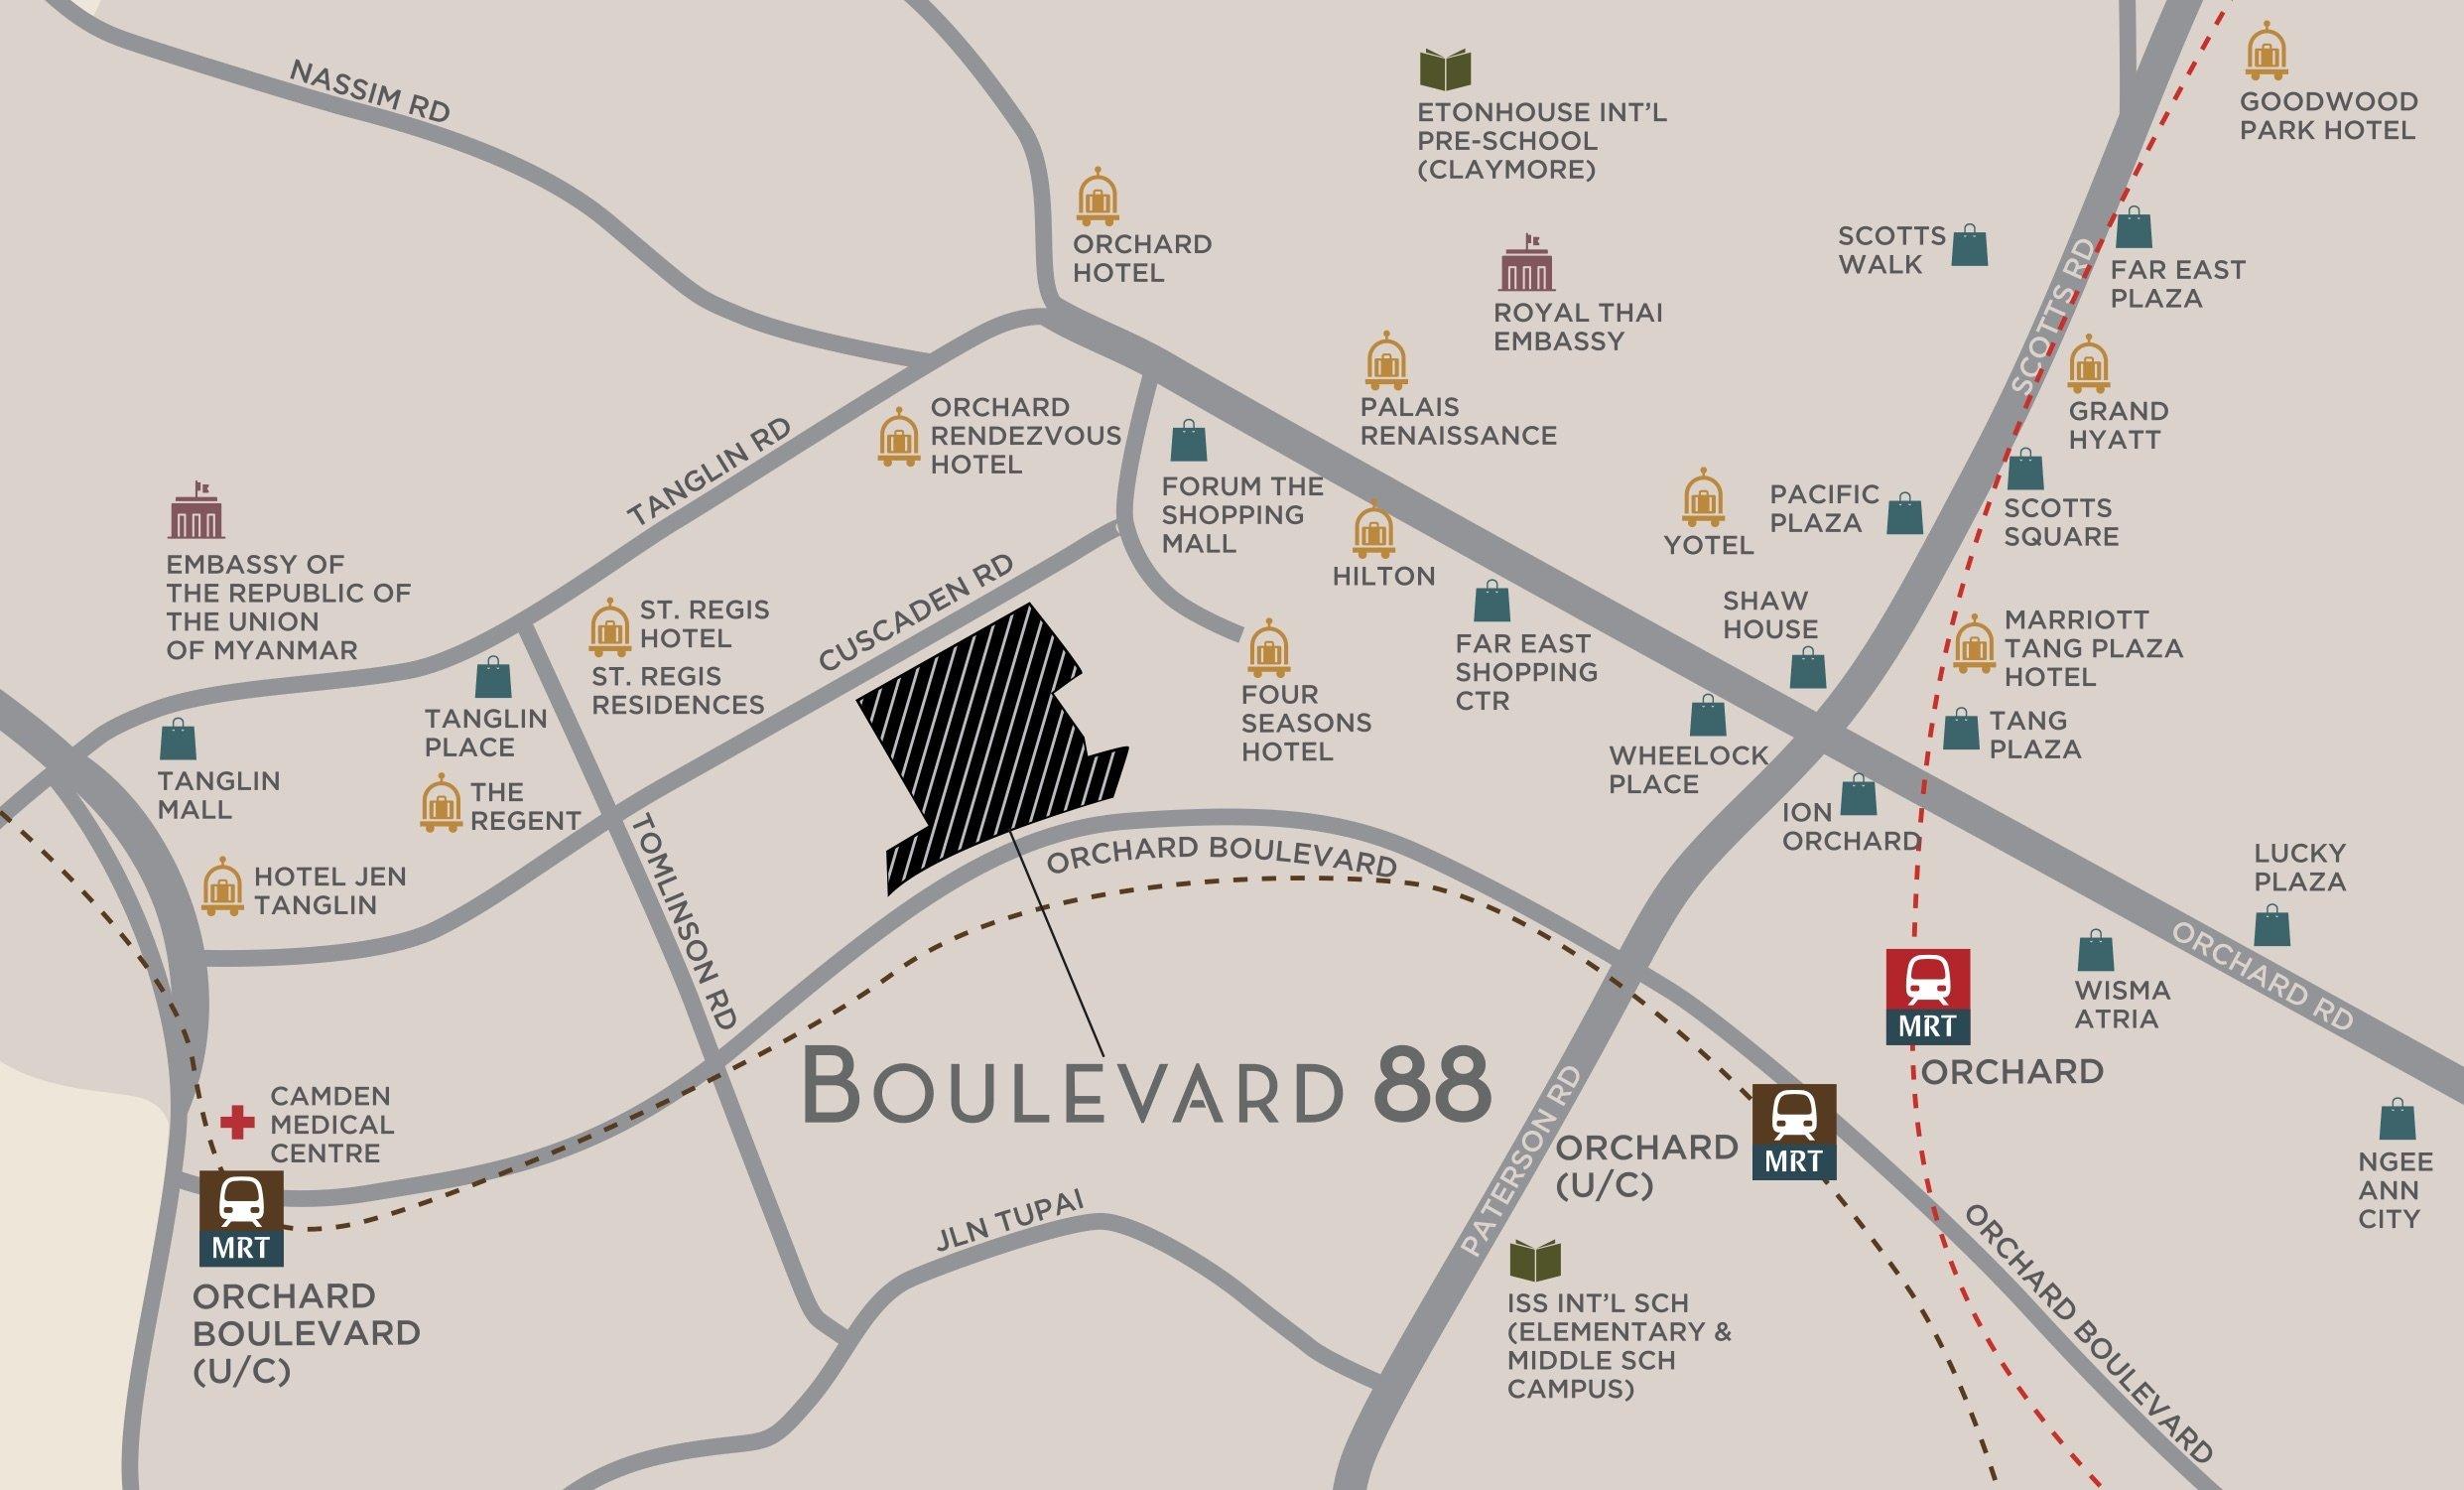 铂瑞雅居 Boulevard 88 condo location map